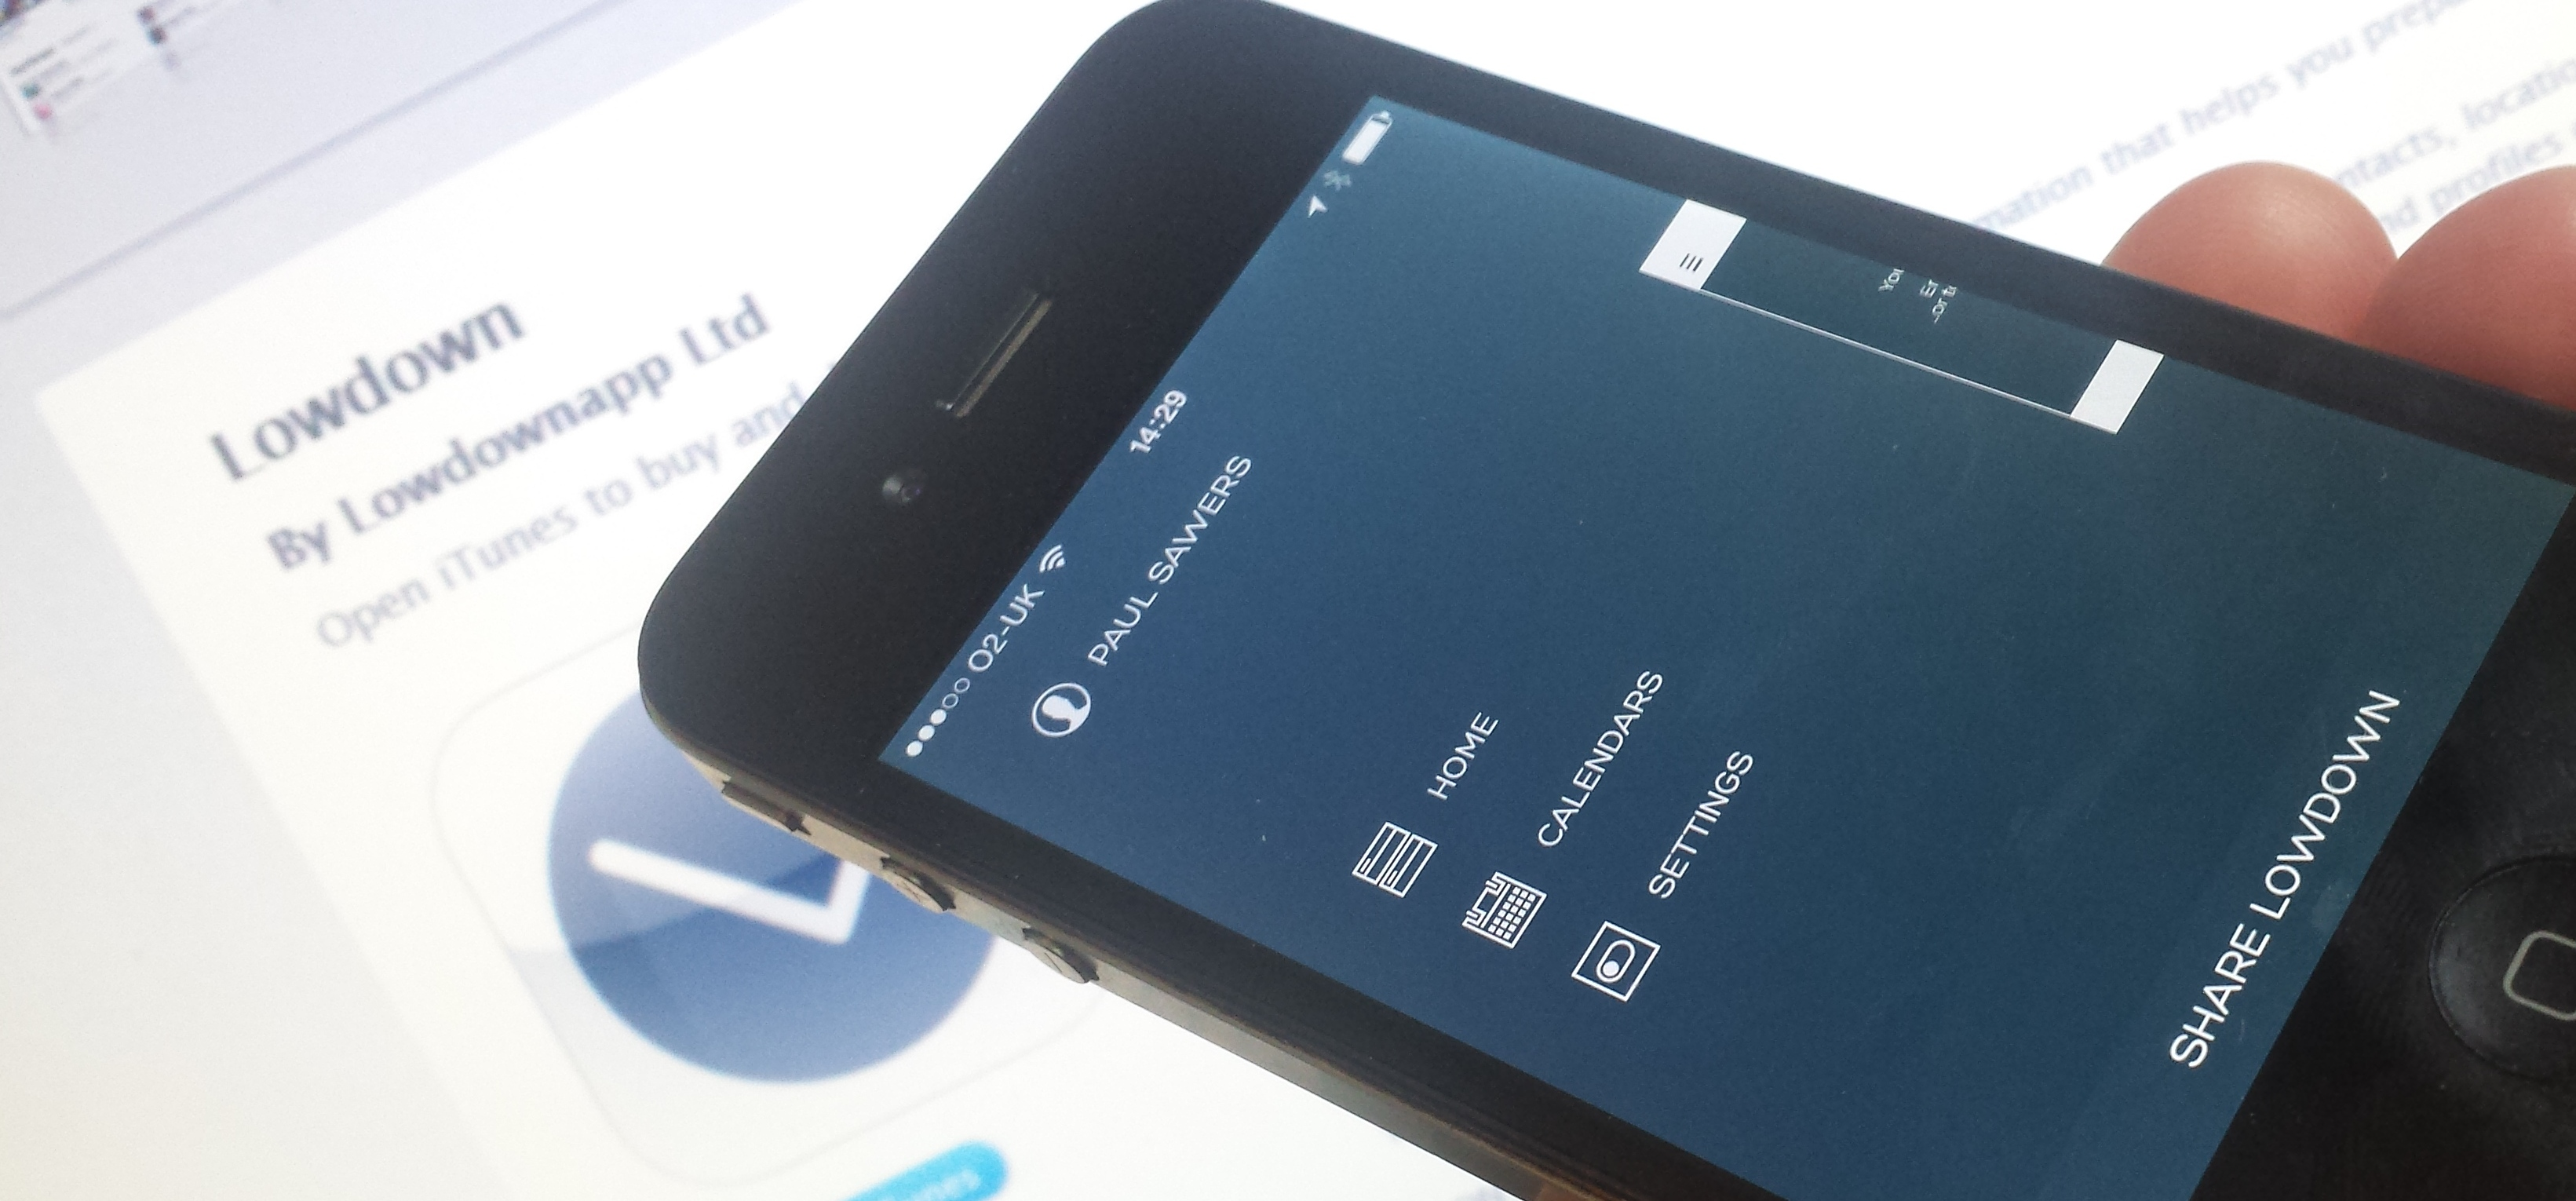 Lowdown: An iPhone App for Smarter Meetings